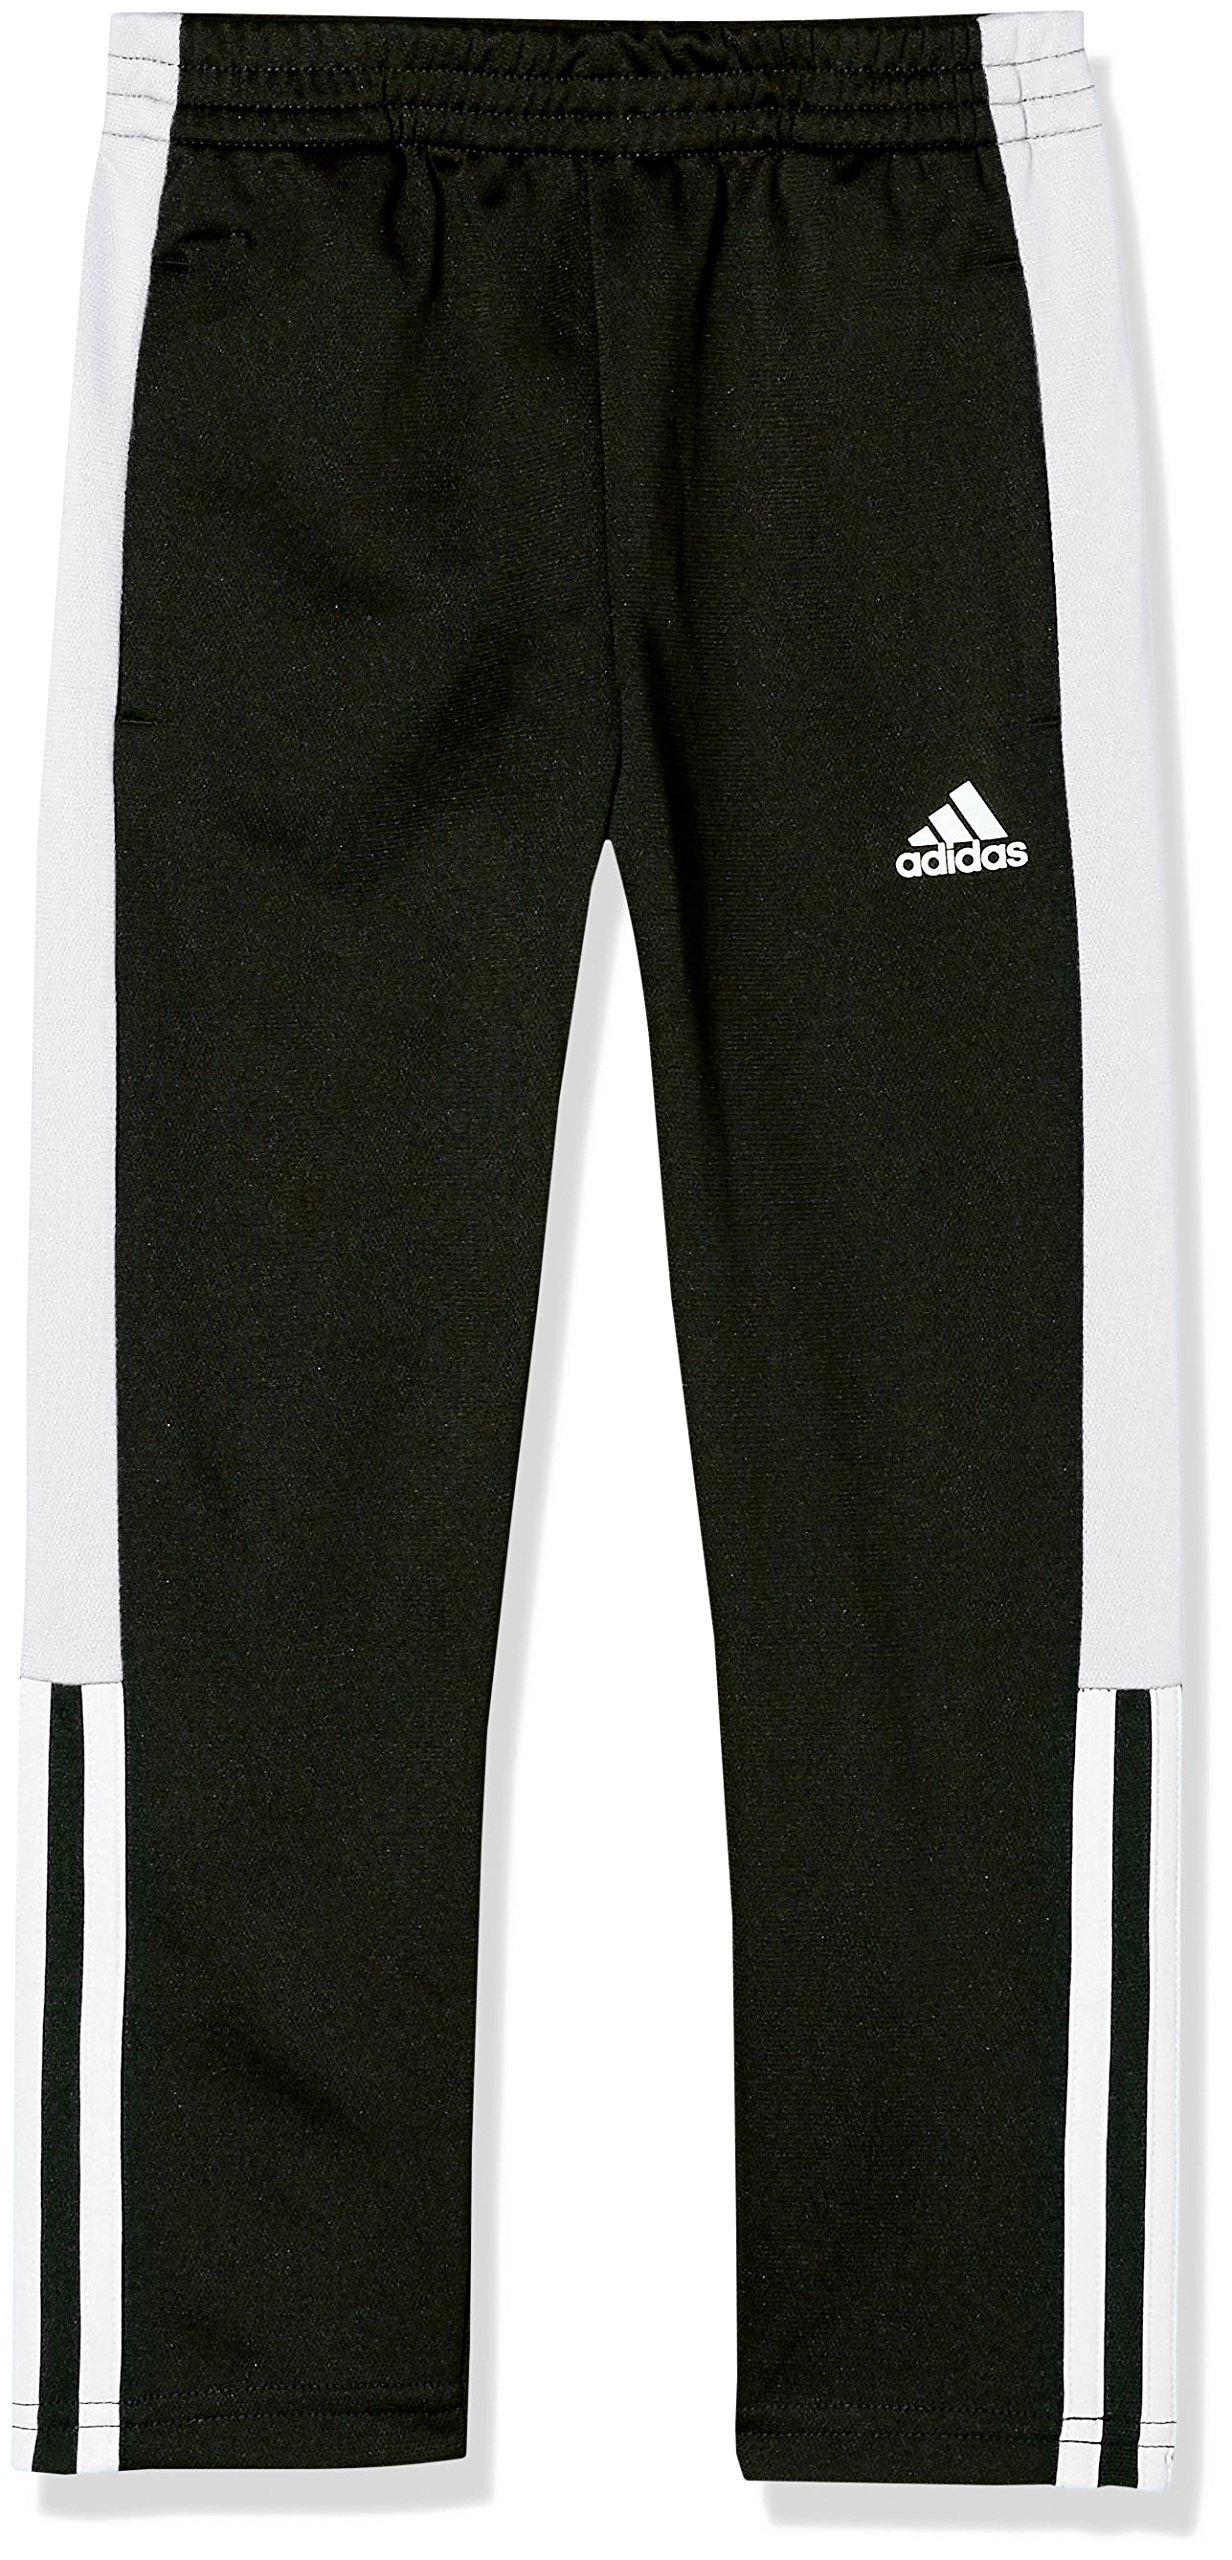 adidas Boys' Toddler Climalite Iconic Striker 17 Pant, Black, 7 by adidas